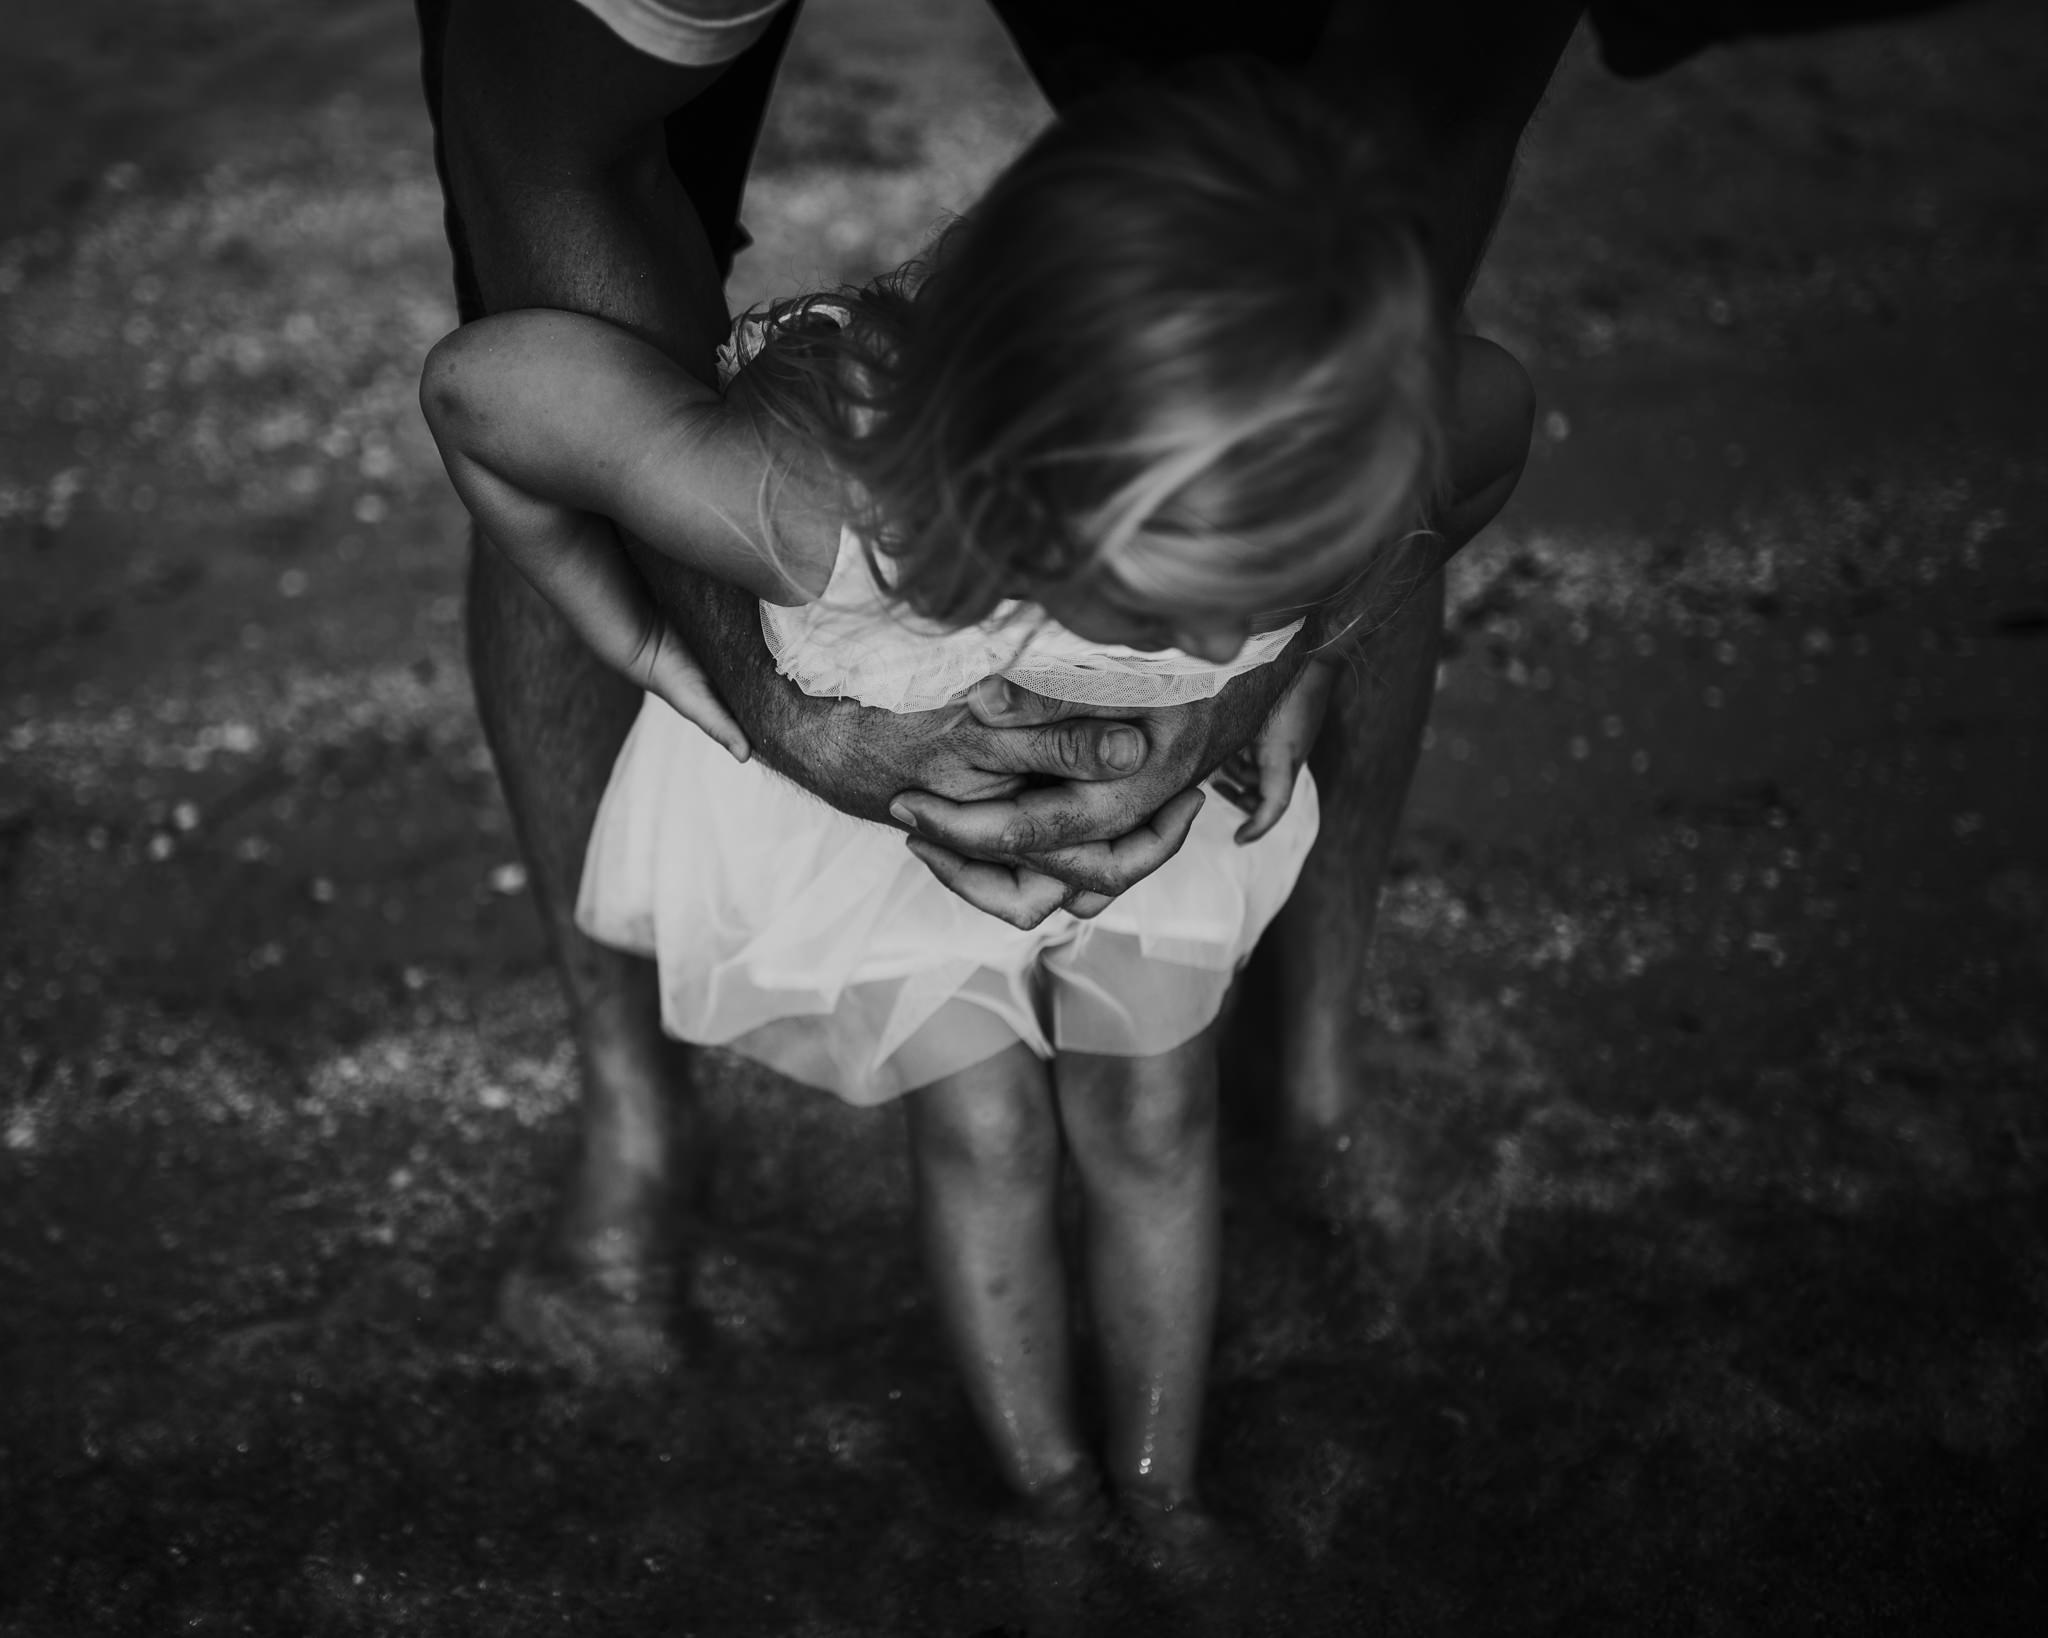 twyla jones photography - treasure coast florida - island family session-5670.jpg